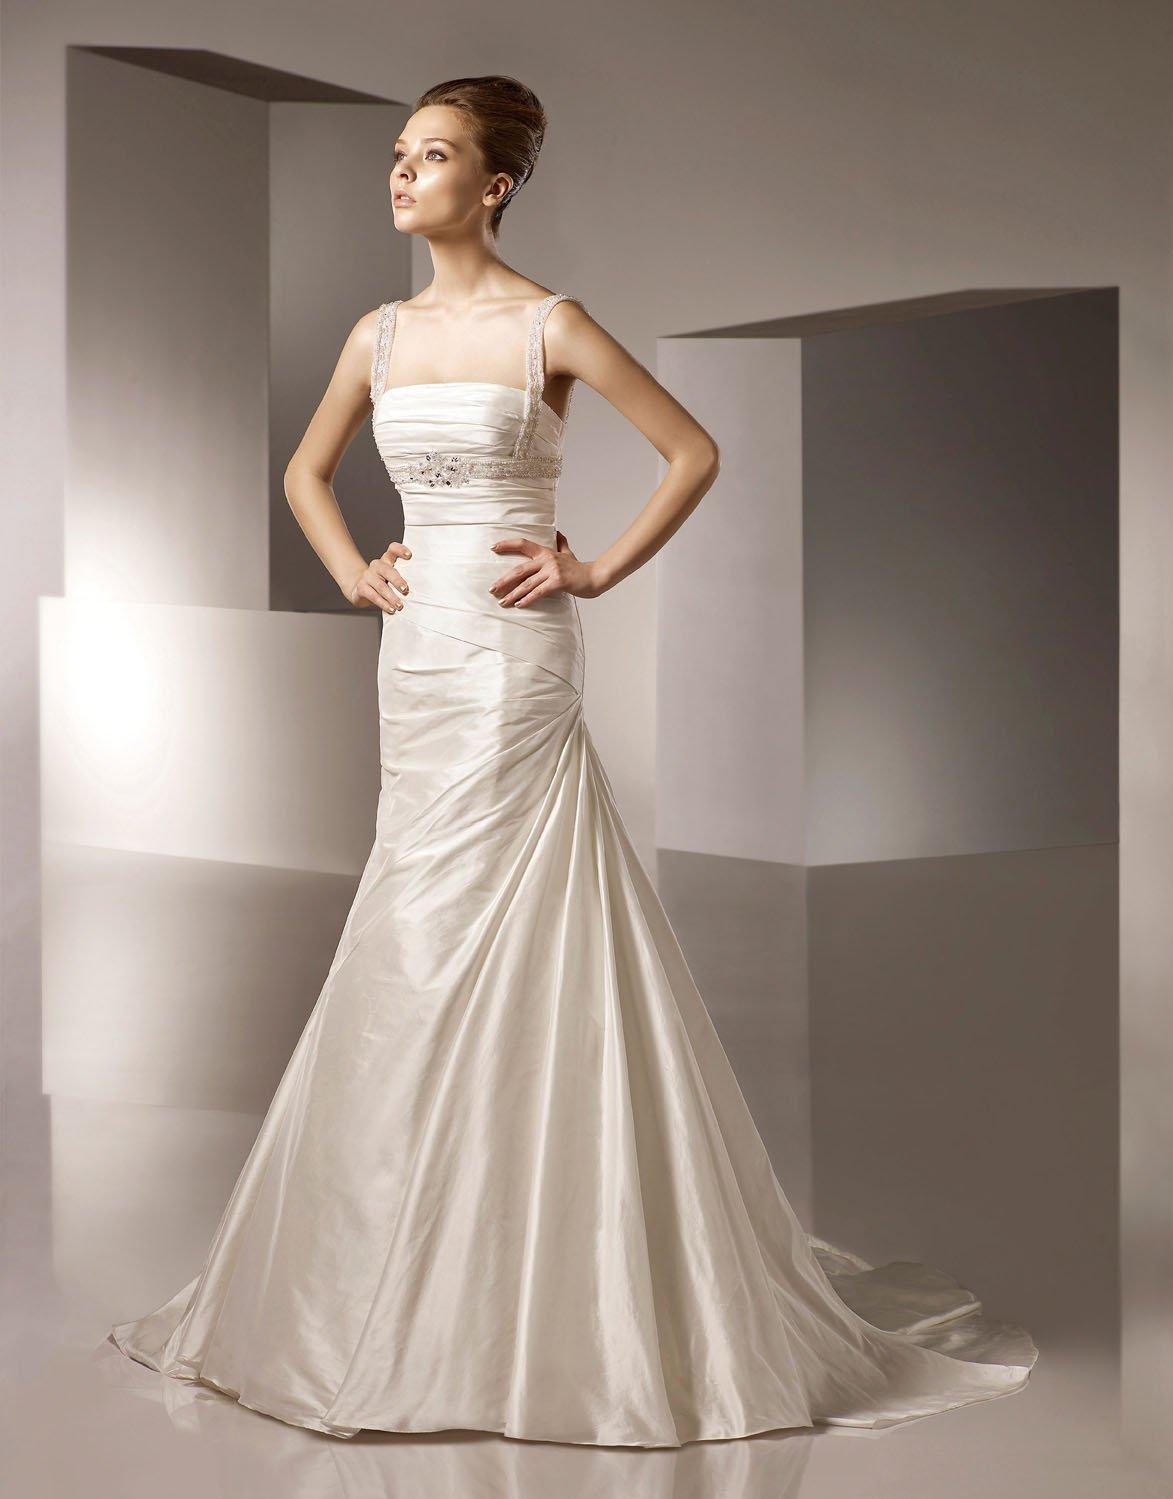 Straight Neckline Beading Detachable Strap Taffeta Wedding Dress Bridal Gown